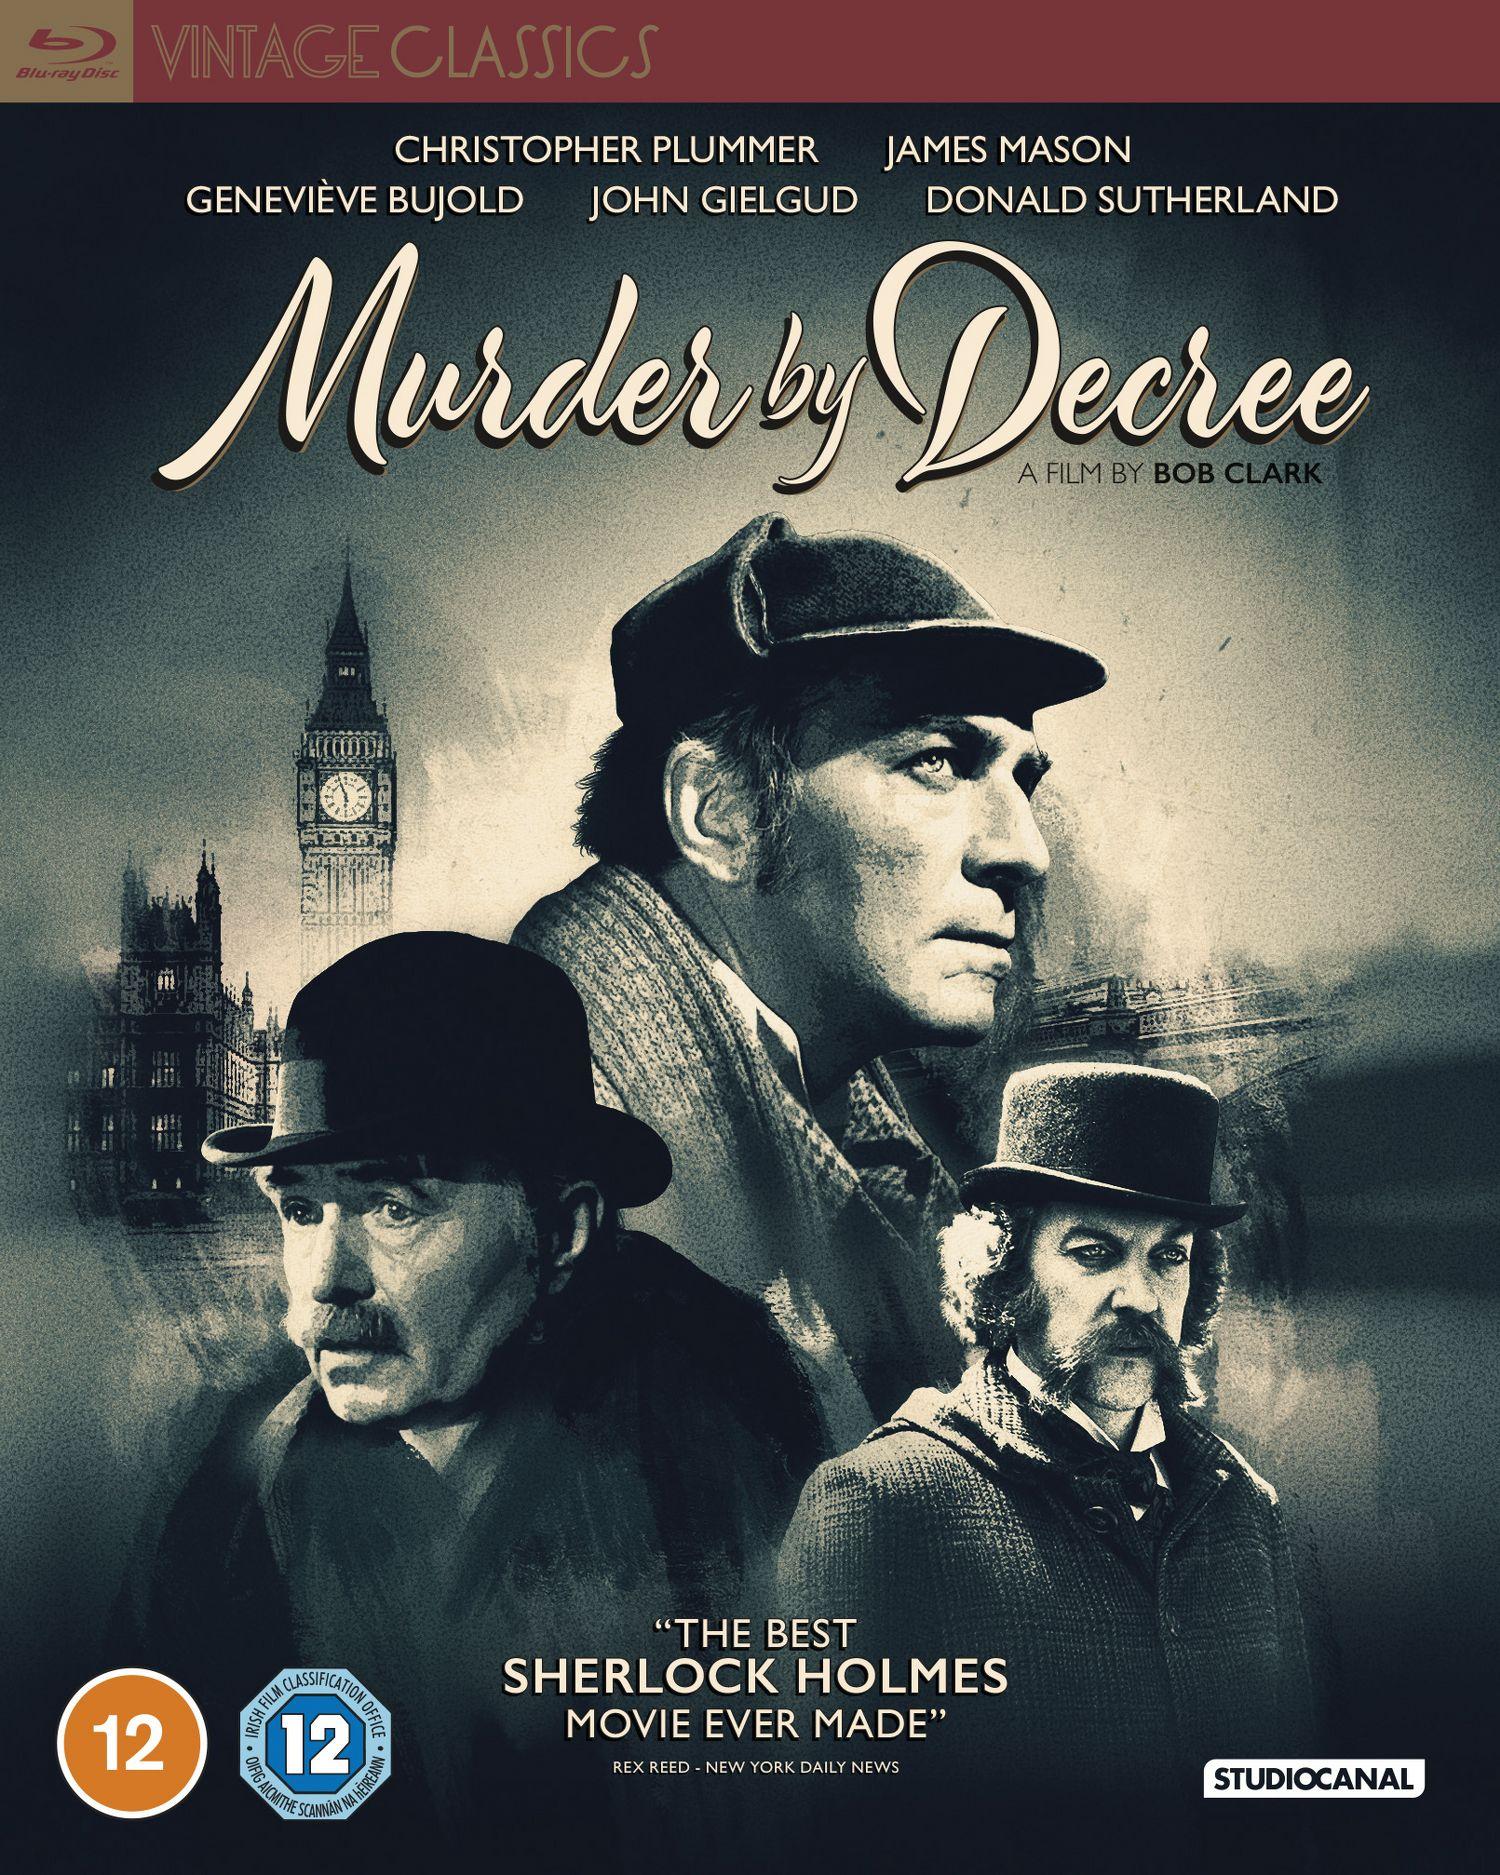 Murder-by-Decree-Final-Packshot-UK-2021-Restoration-English-1611×2014-OPTBD4417-2D-jpg